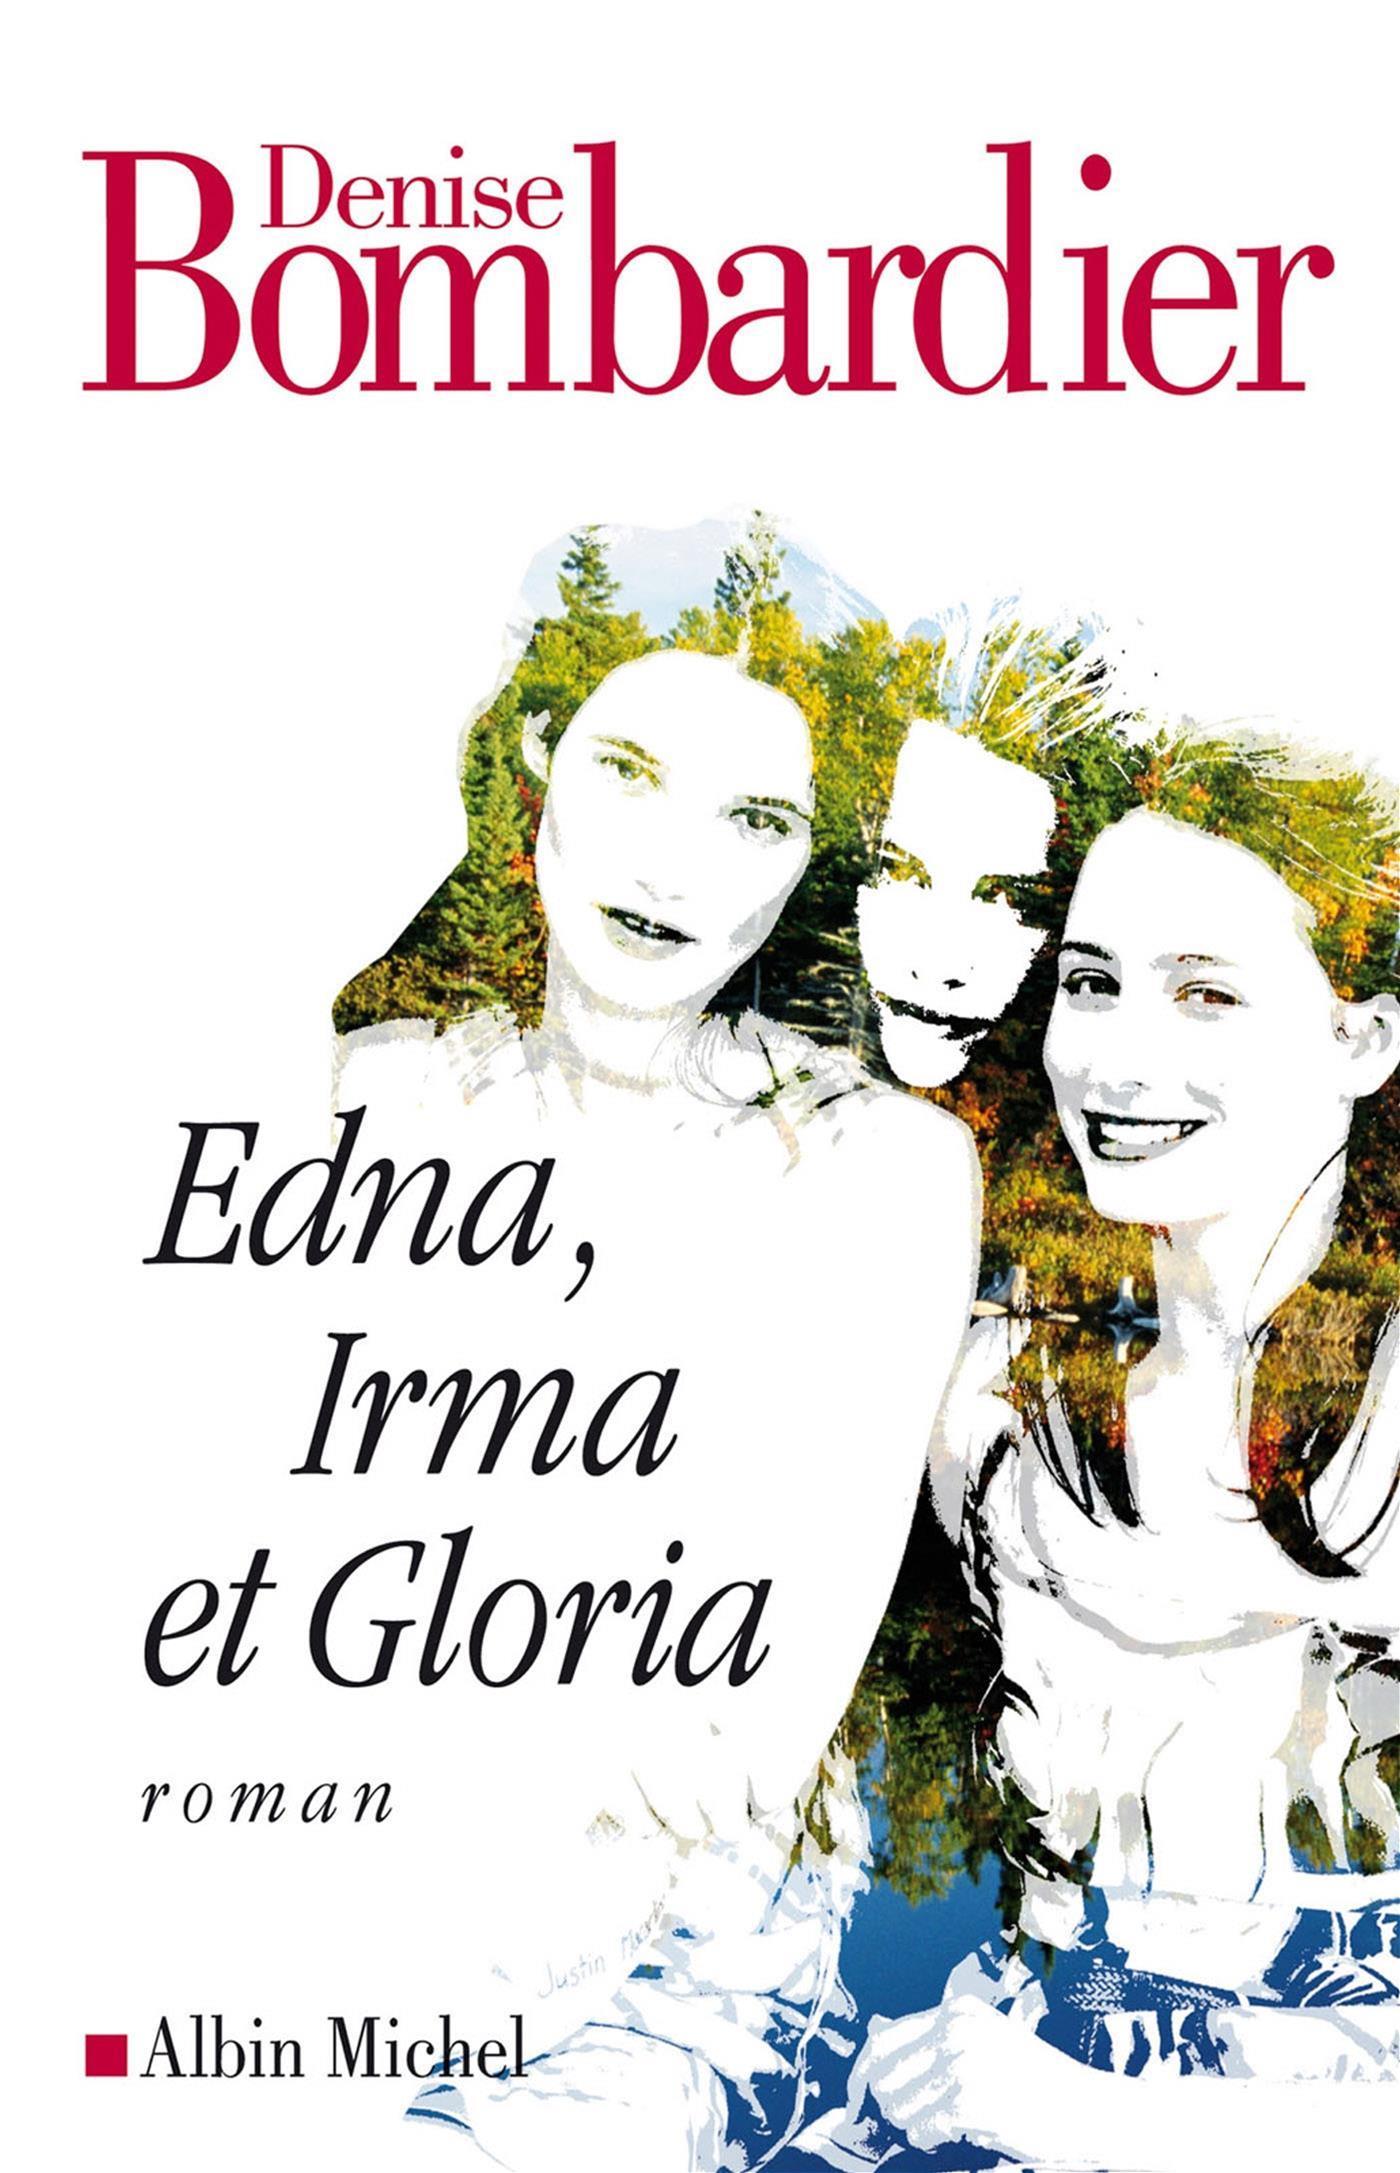 Edna, Irma et Gloria